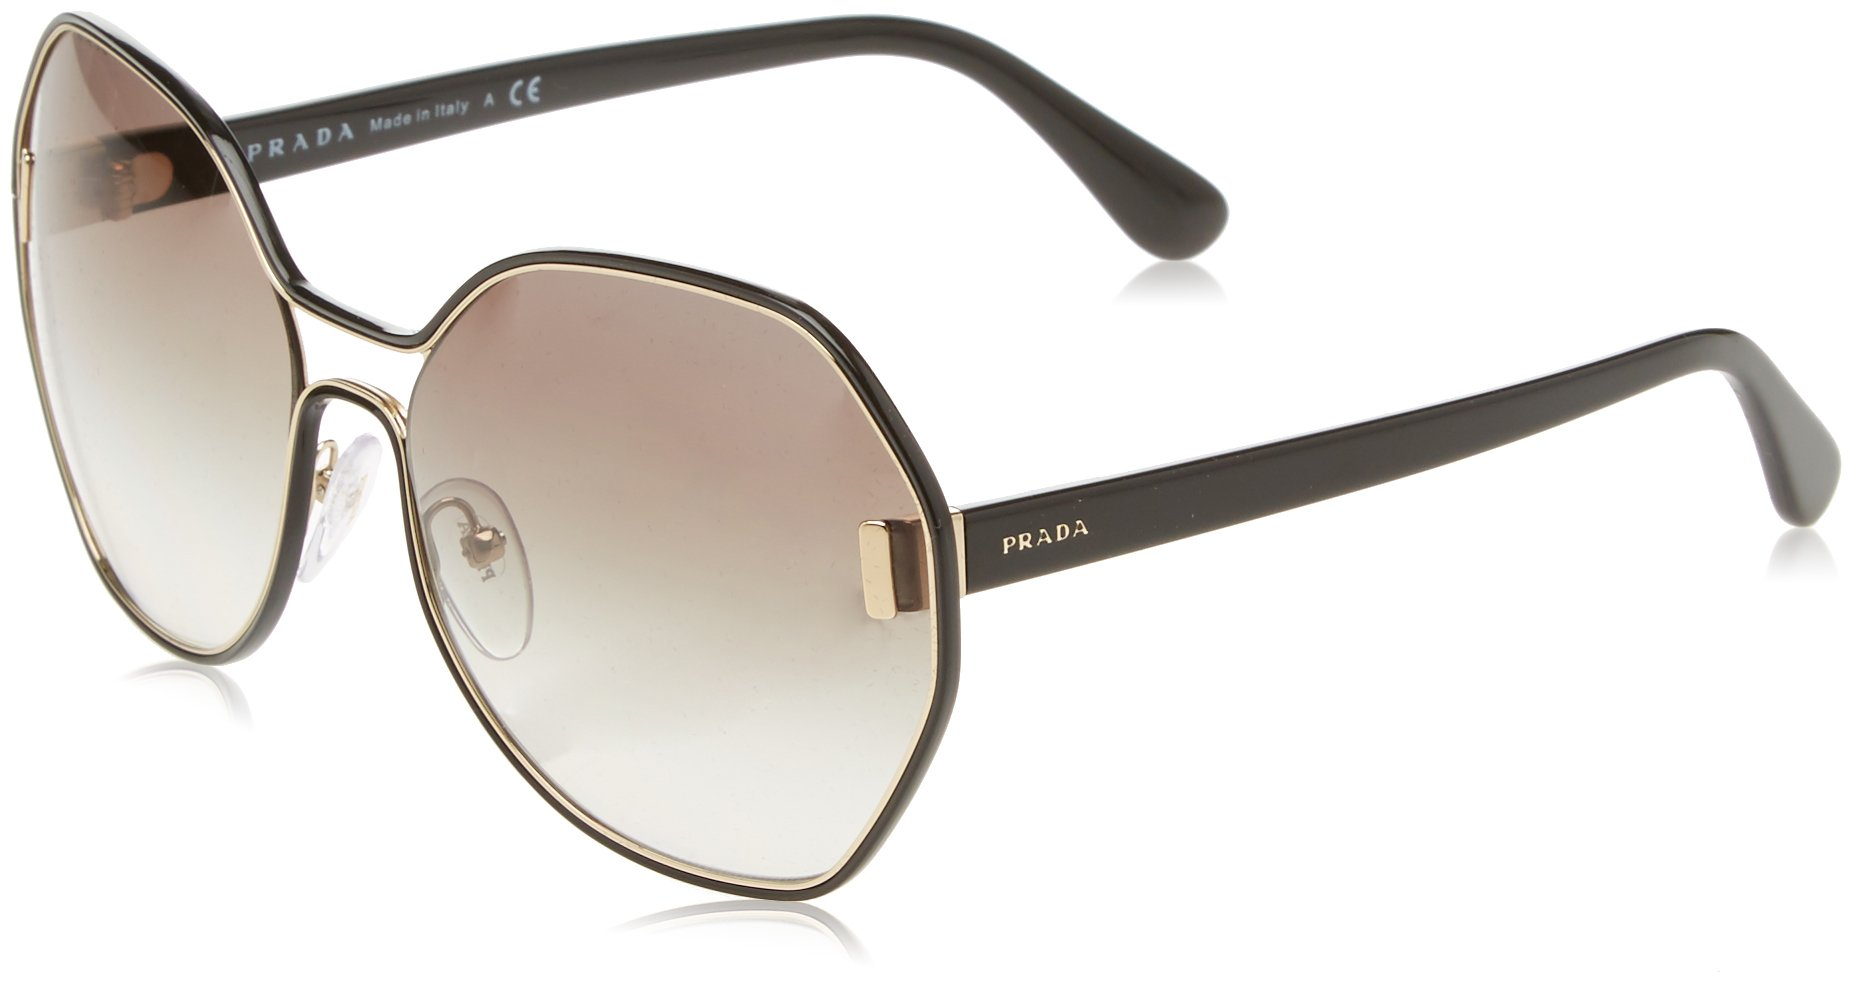 Prada Women's 0PR 53TS Pale Gold/Black/Grey Gradient Sunglasses